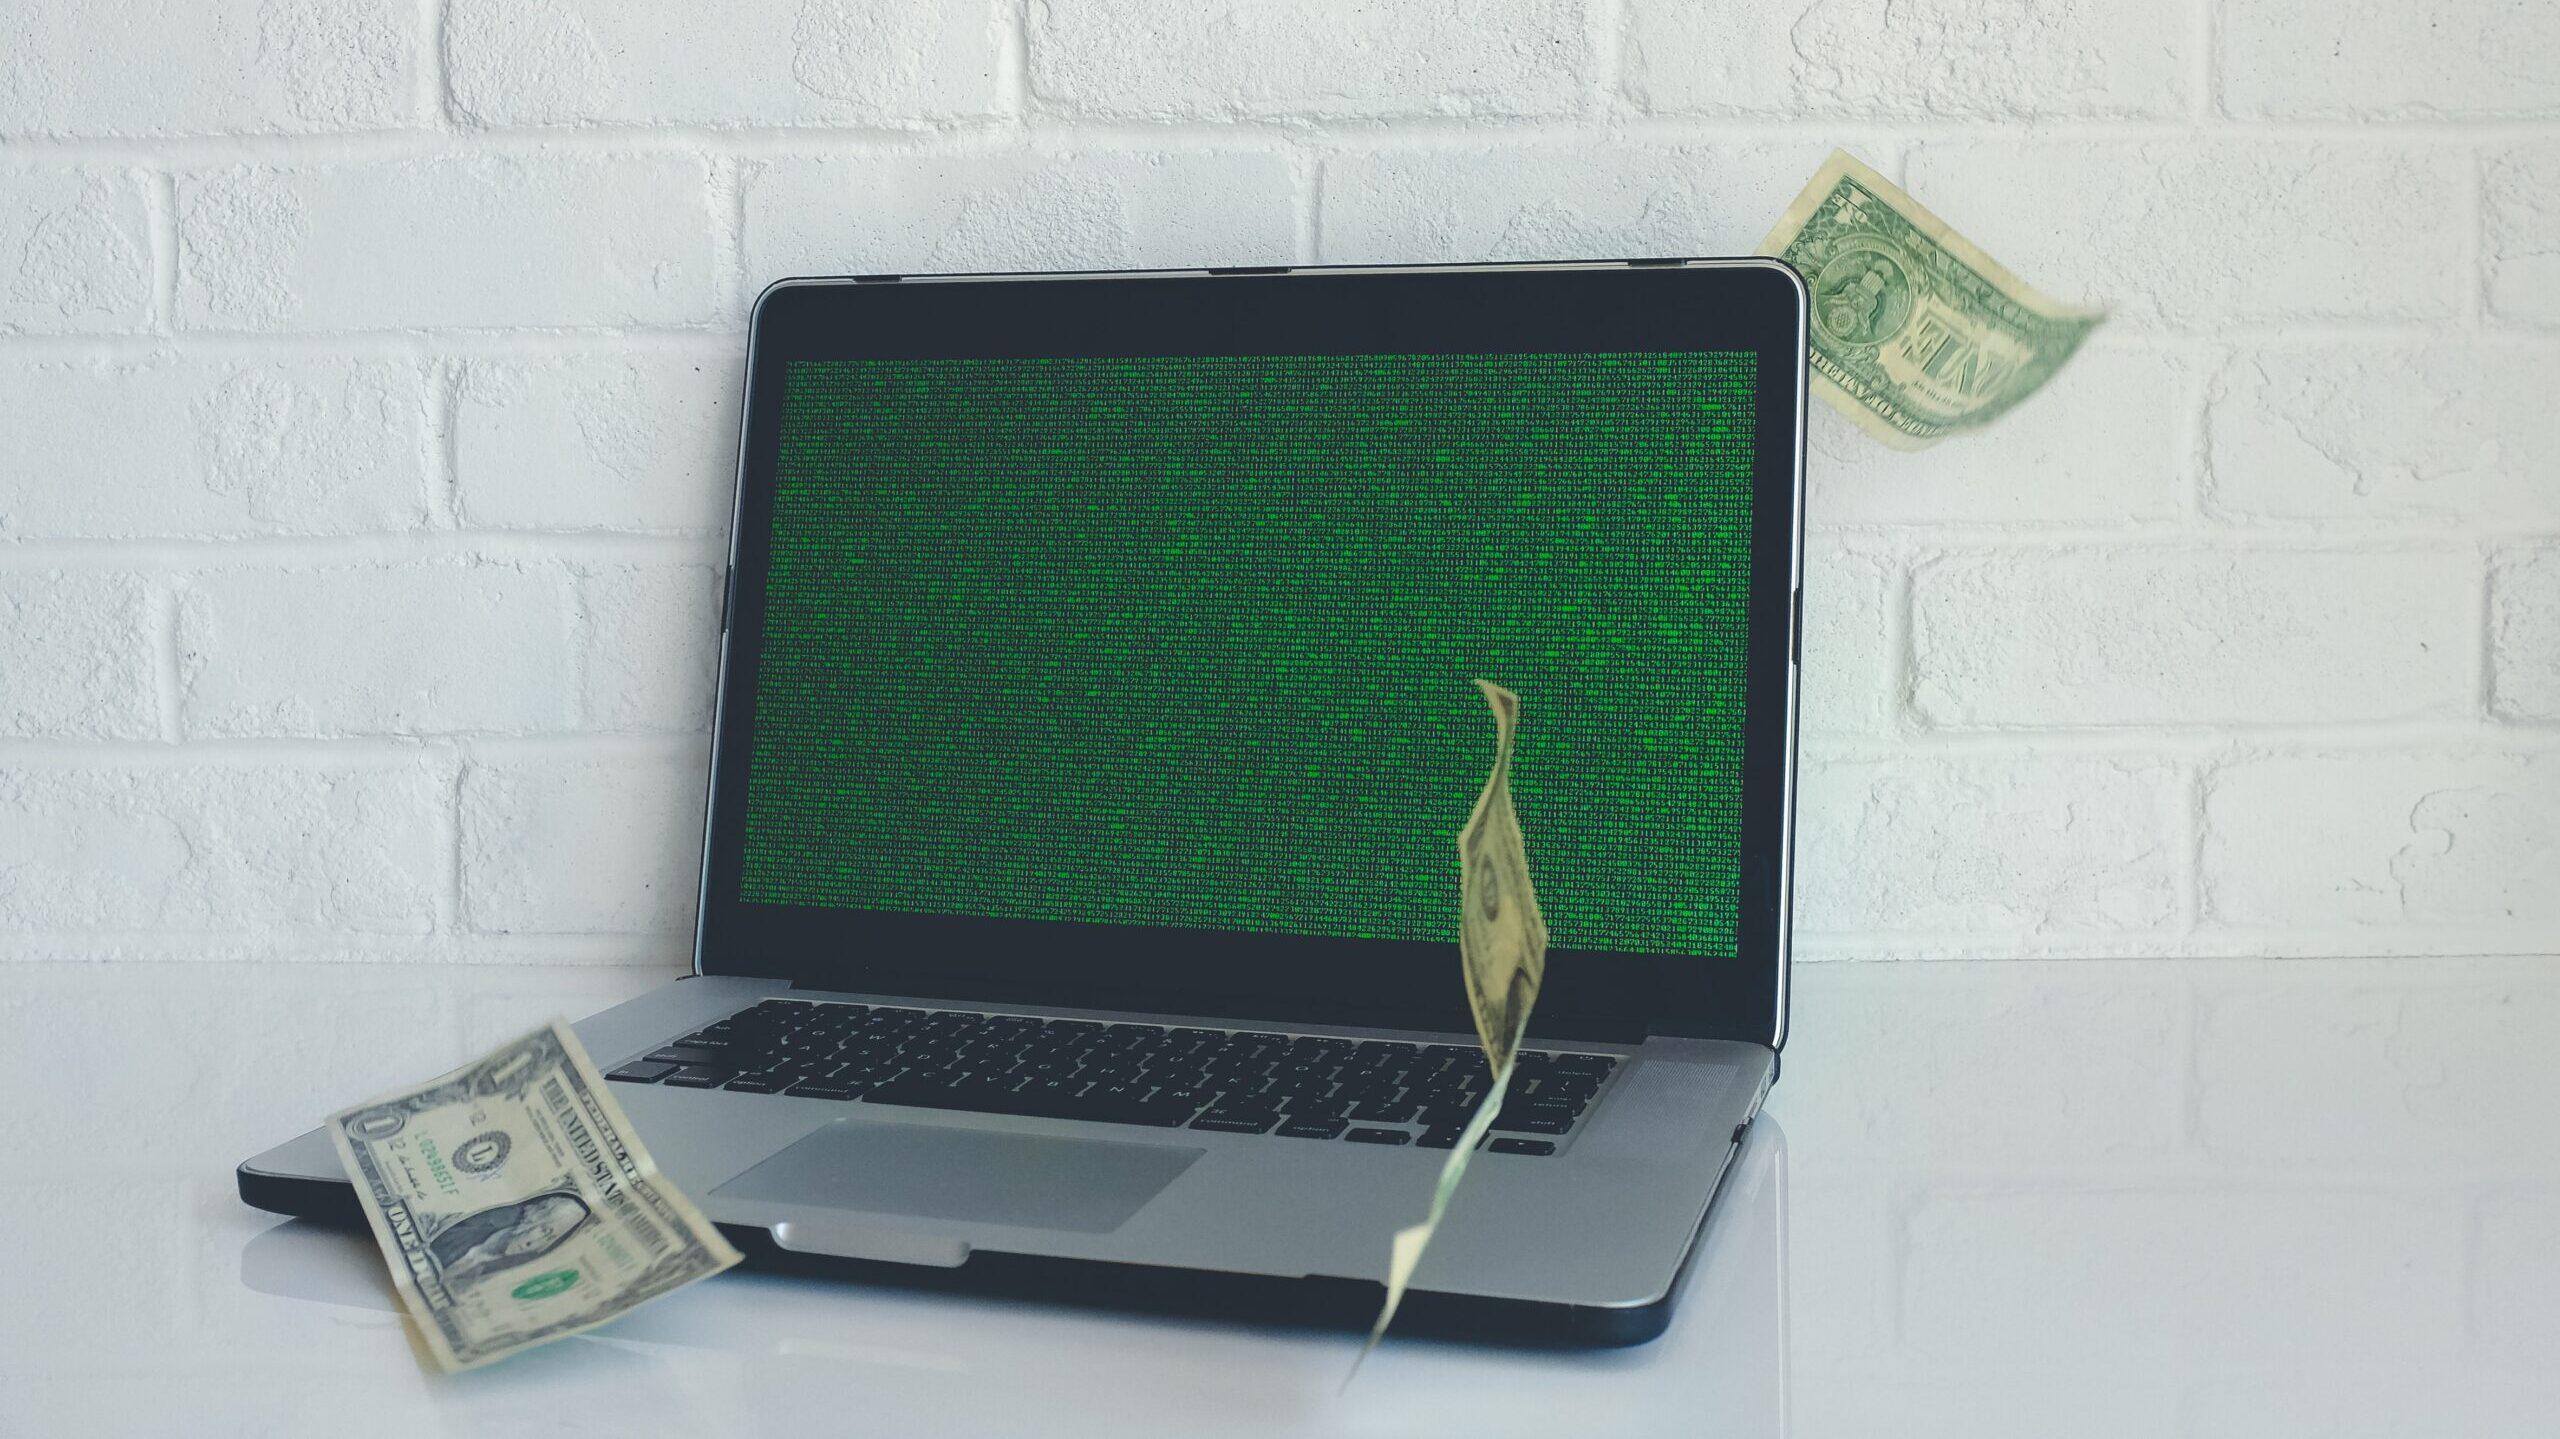 A laptop with dollar bills raining down on it